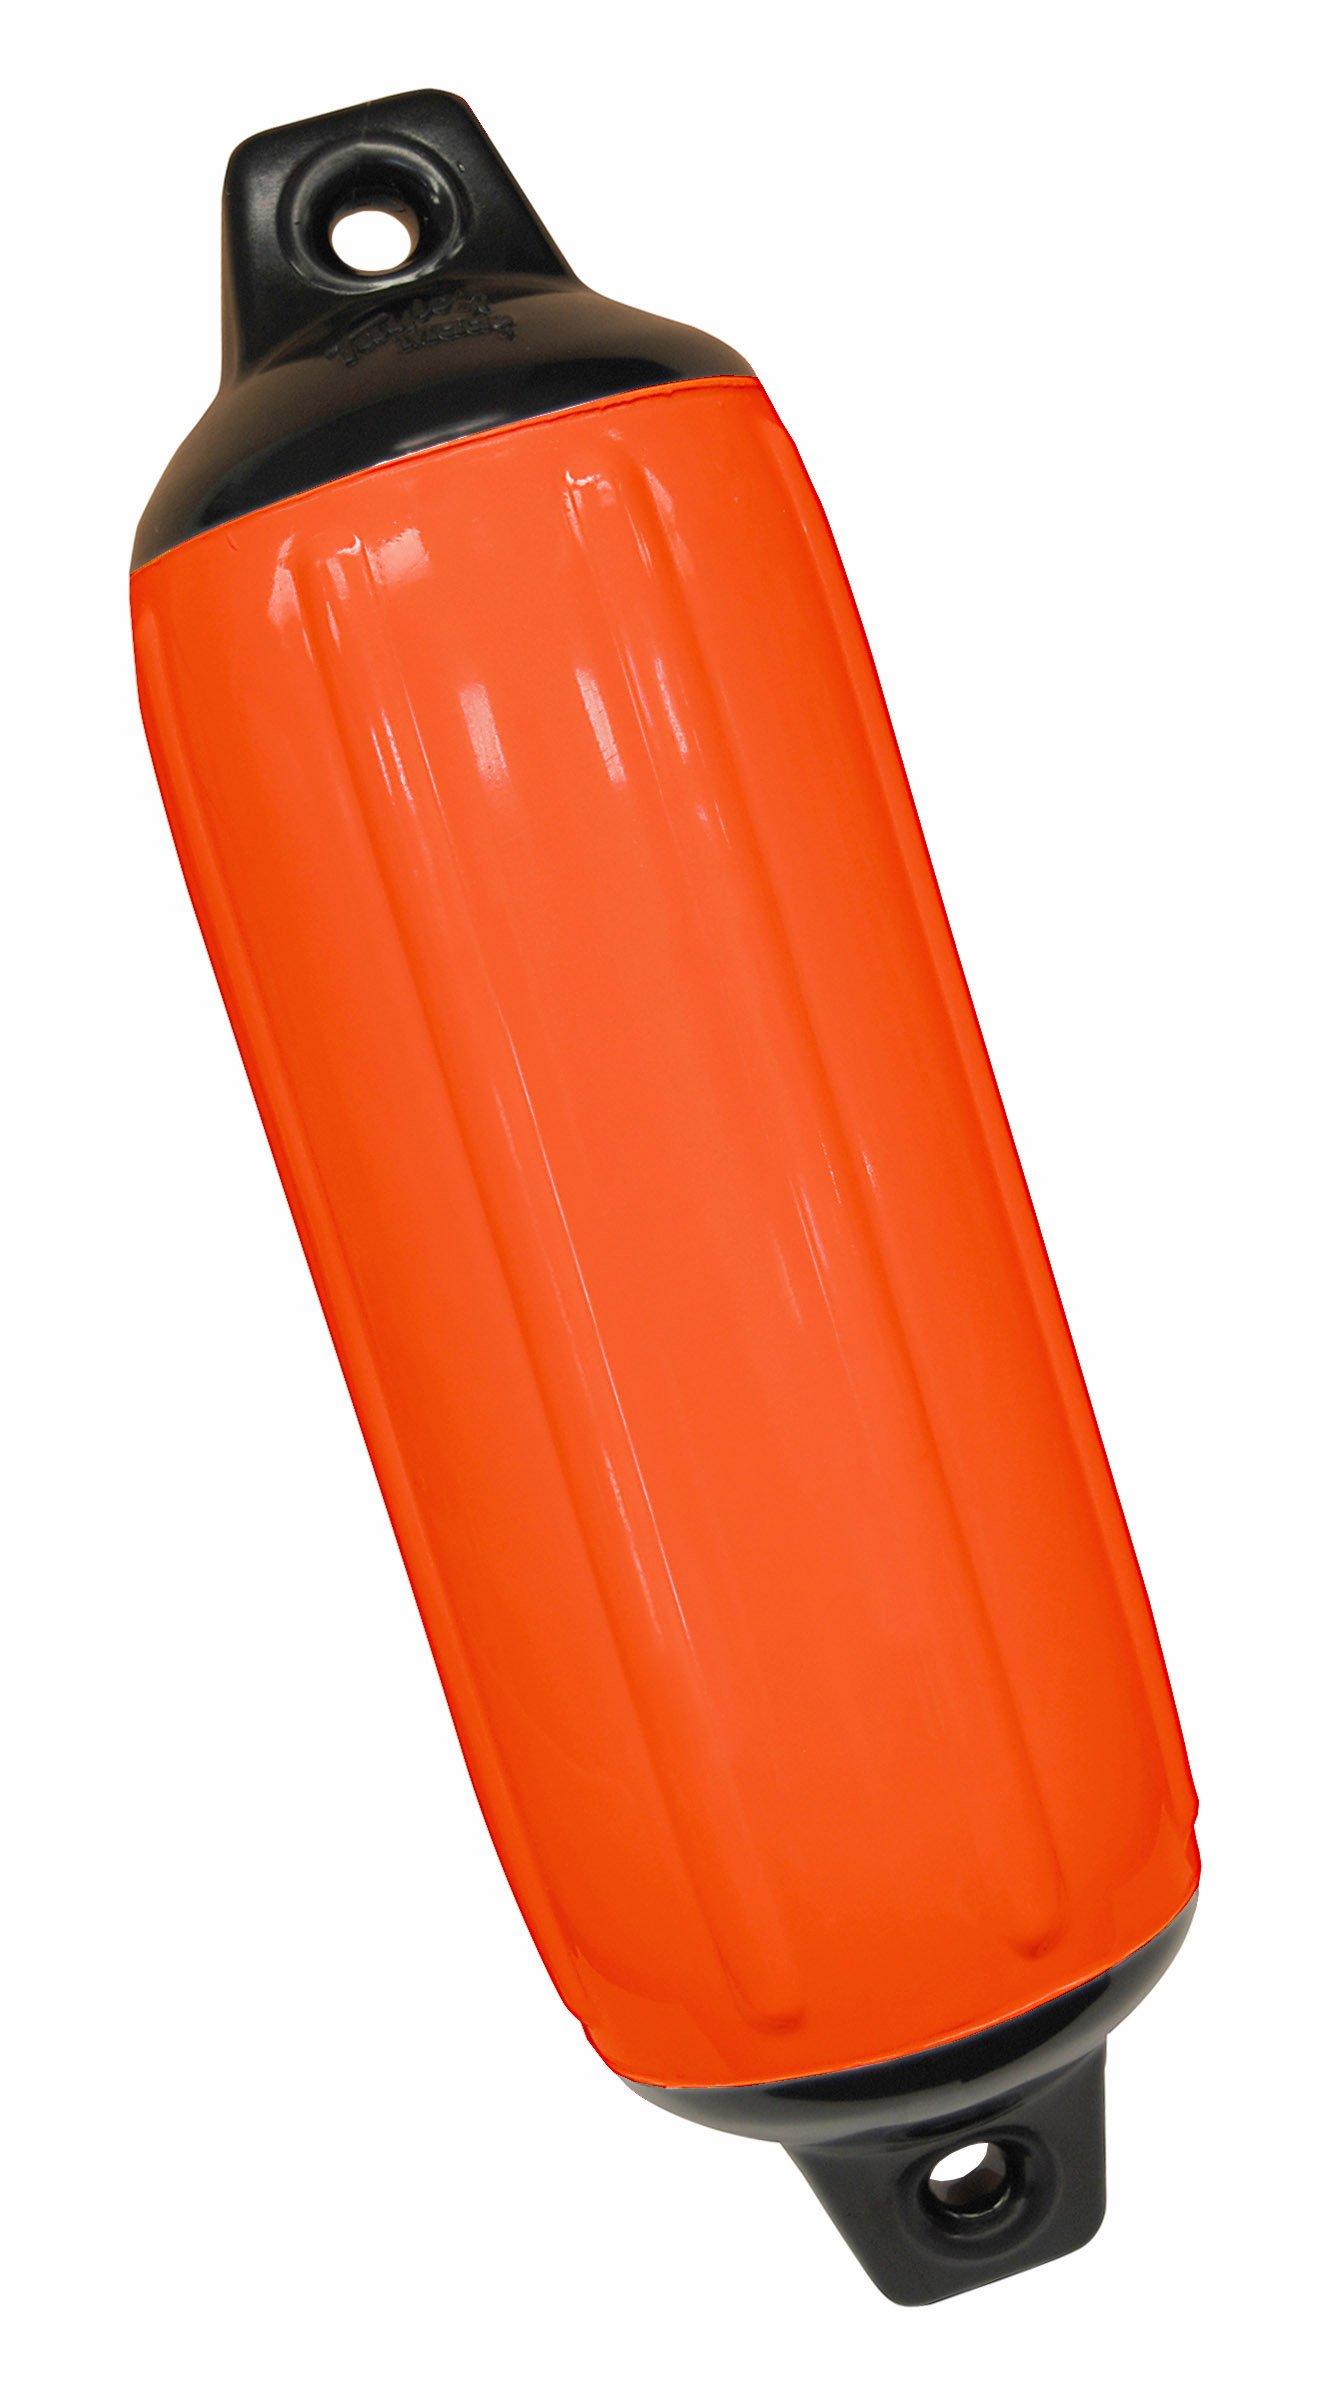 Taylor Made Products 730824 Super Gard Inflatable Vinyl Boat Fender, 8.5 x 26, Blaze Orange